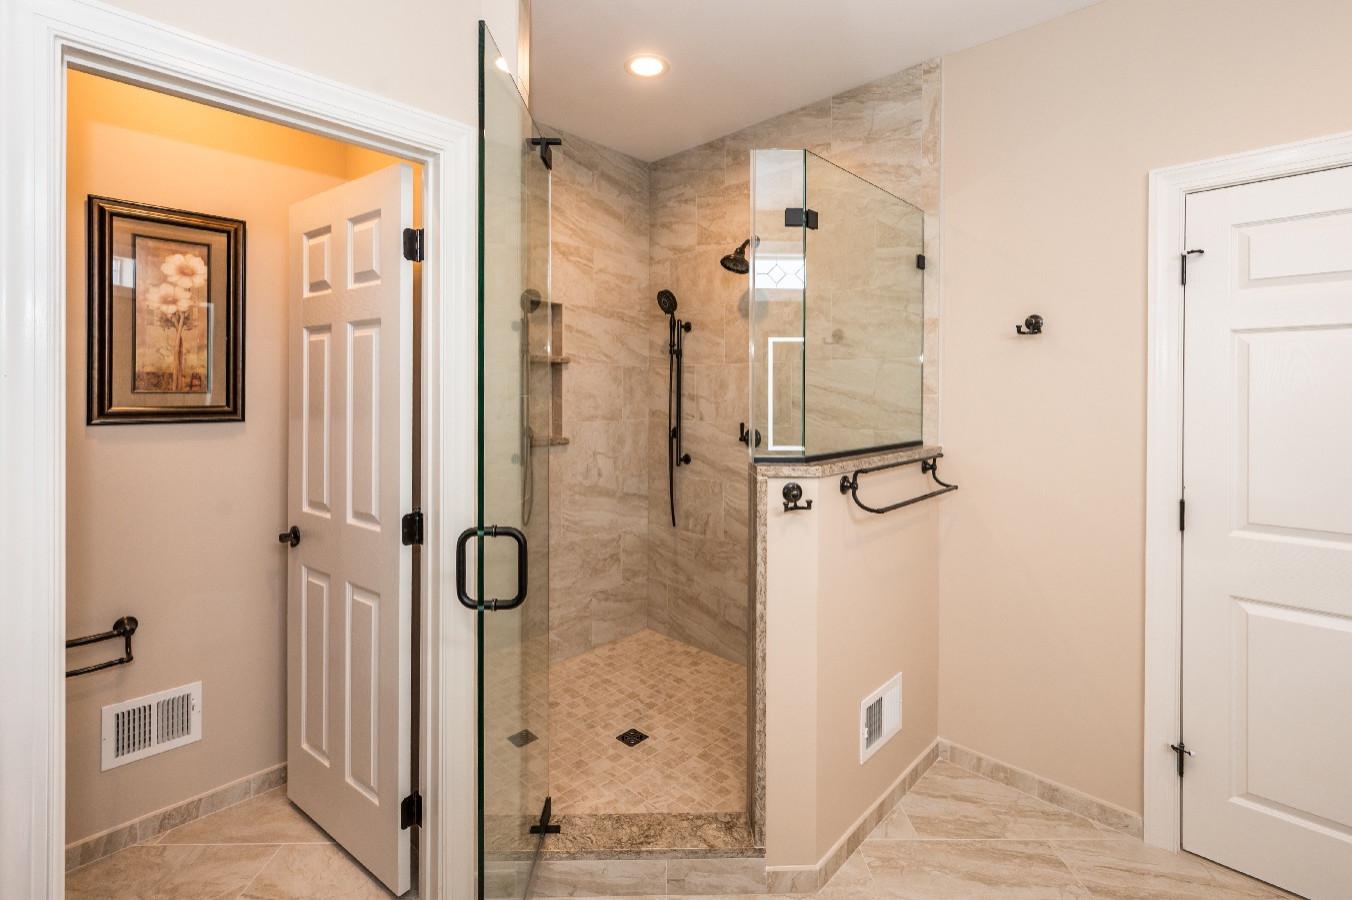 Haymarket Transitional Master Bathroom Remodel _ 13036